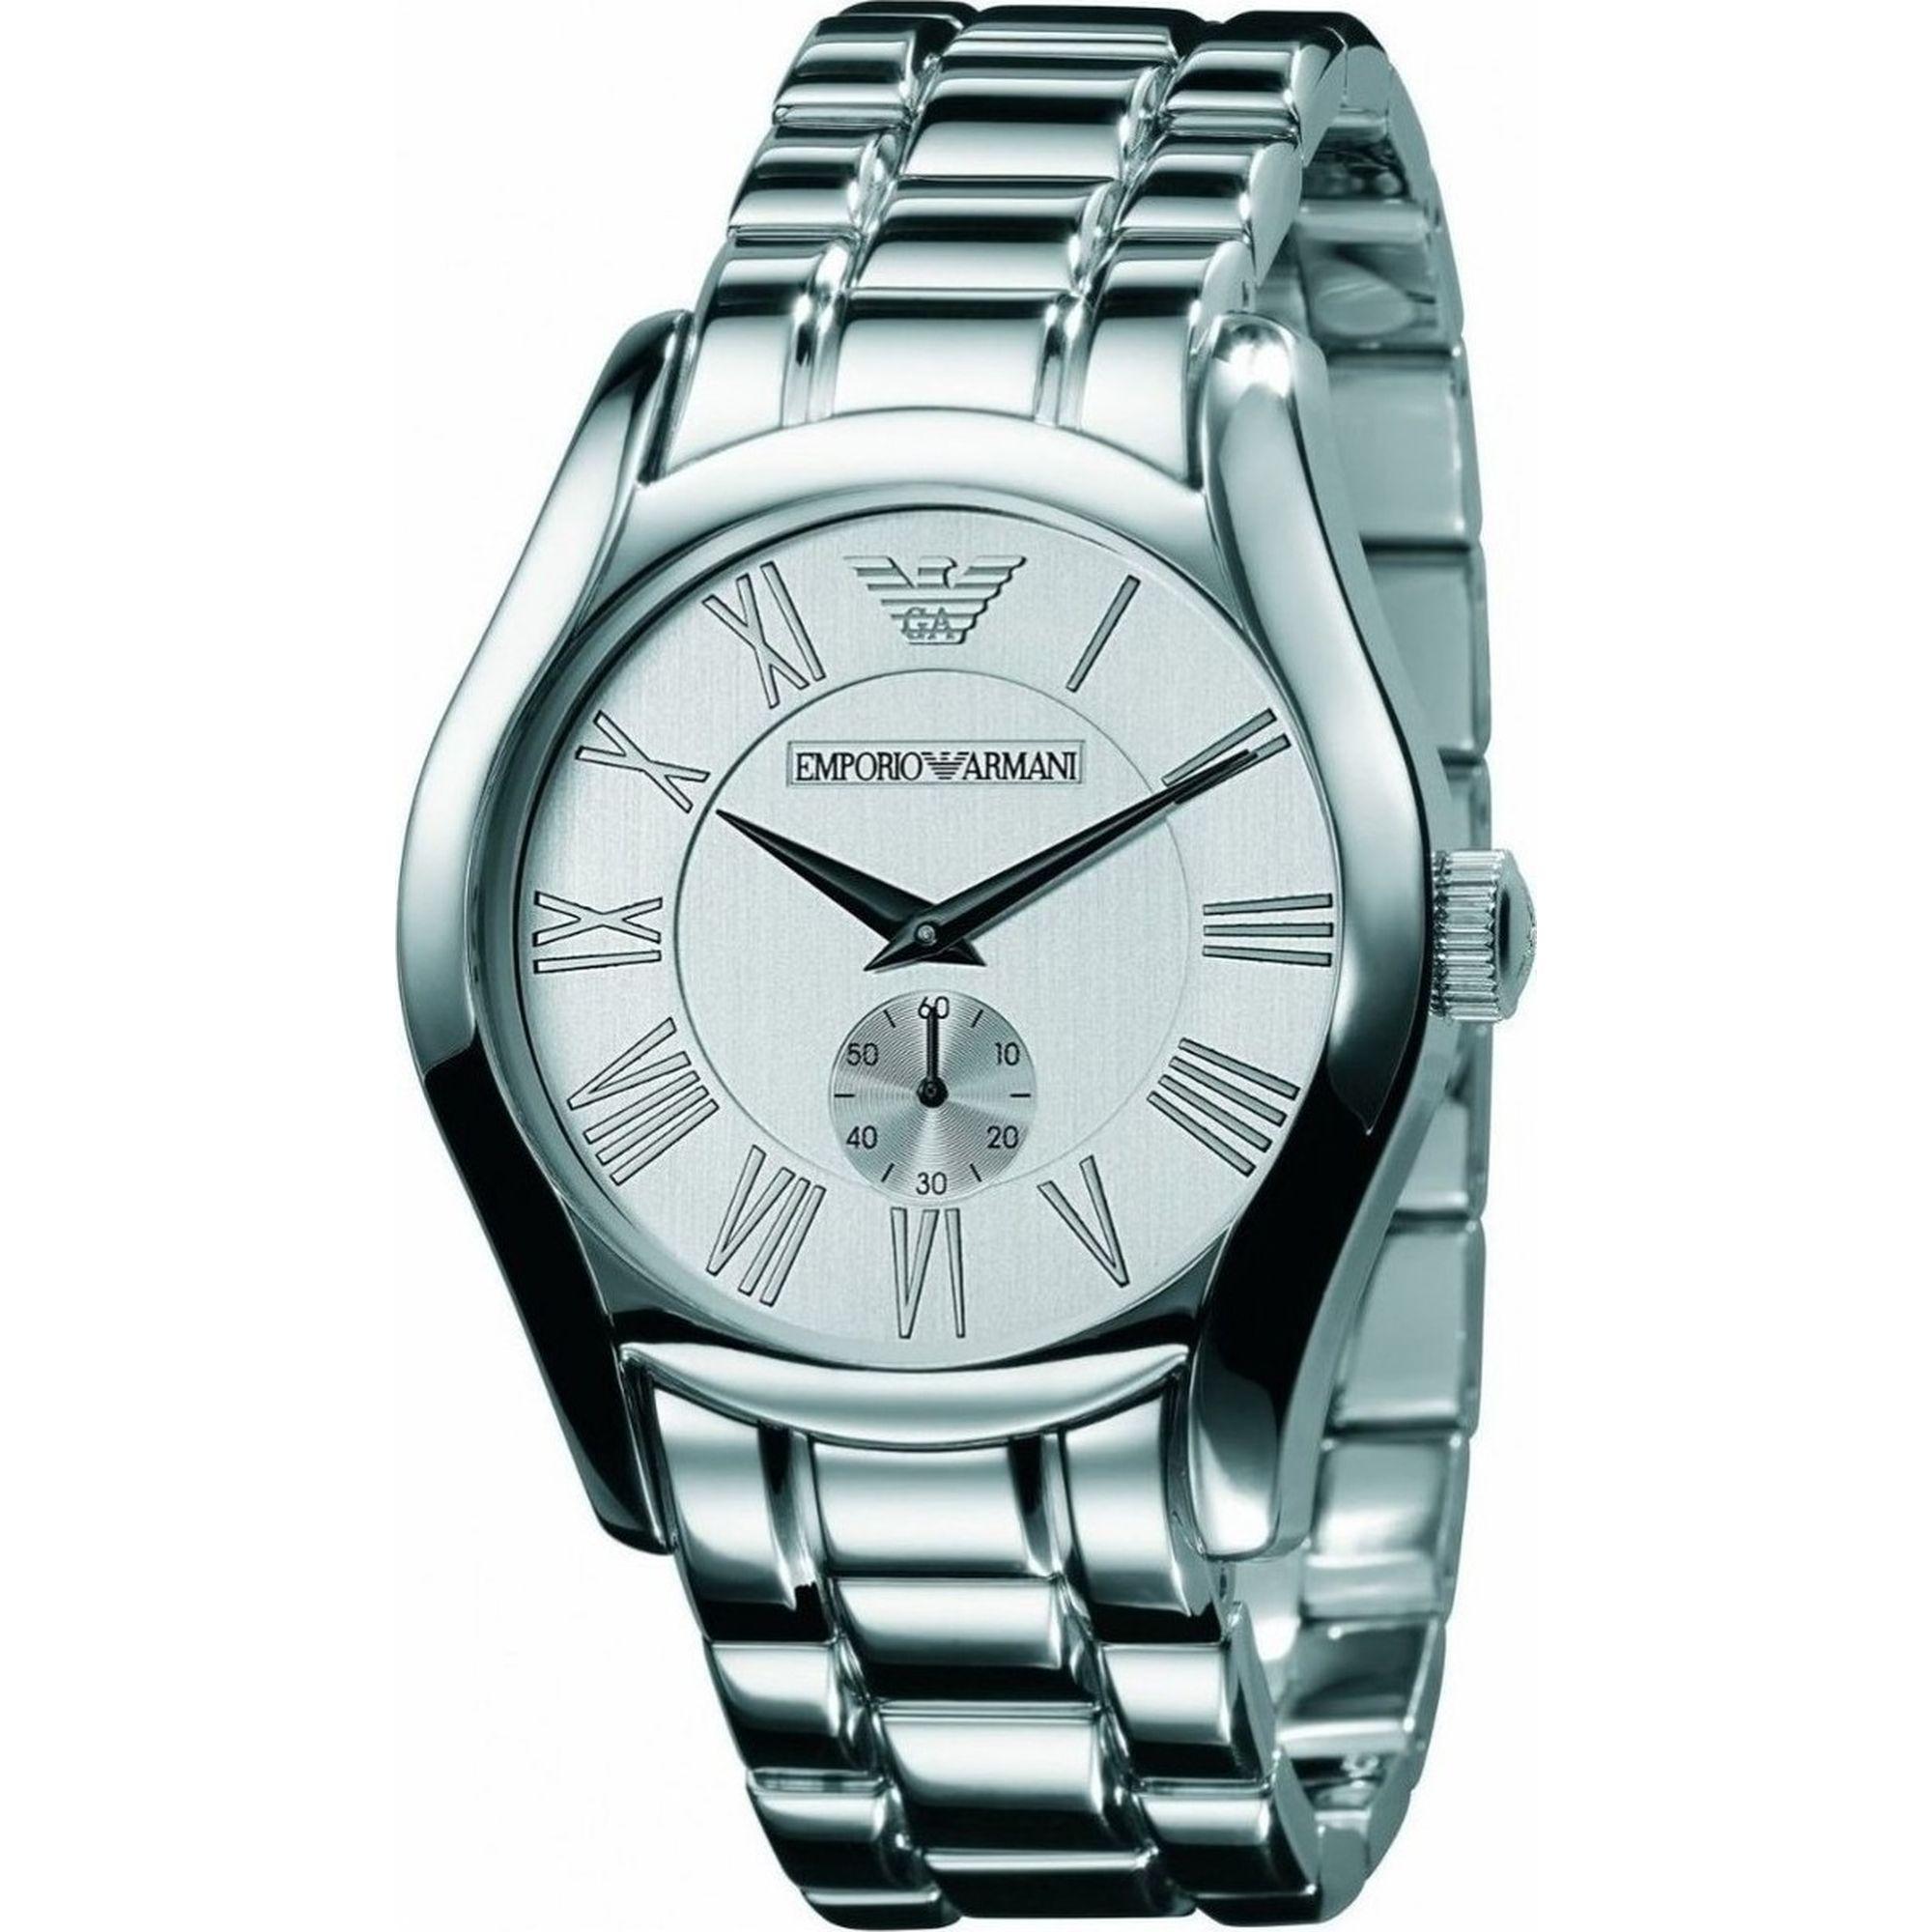 Emporio Armani με Ασημί Καντράν και Μπρασελέ AR0647, ρολόι, ρολόγια, Emporio Armani, Ανδρικό ρολόι, Δωρεάν μεταφορικά